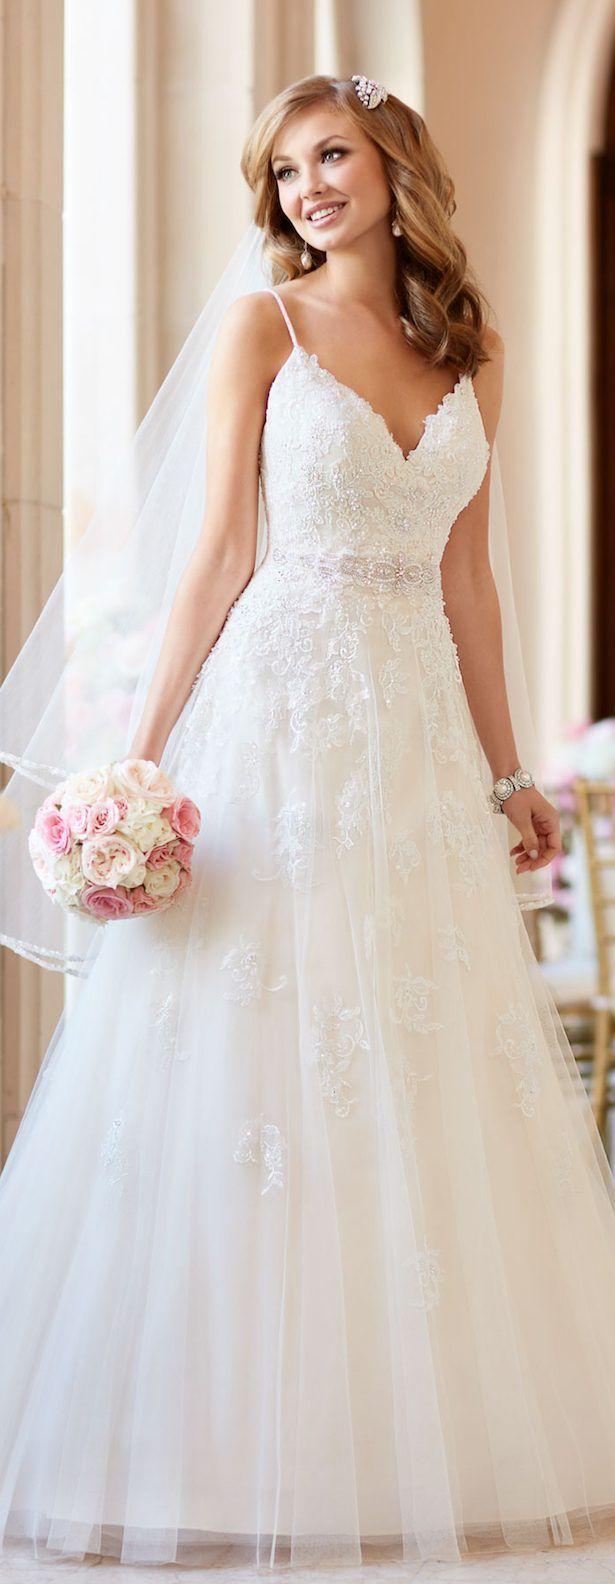 Stella York Fall 2016 Bridal Collection | Stella york, Wedding dress ...